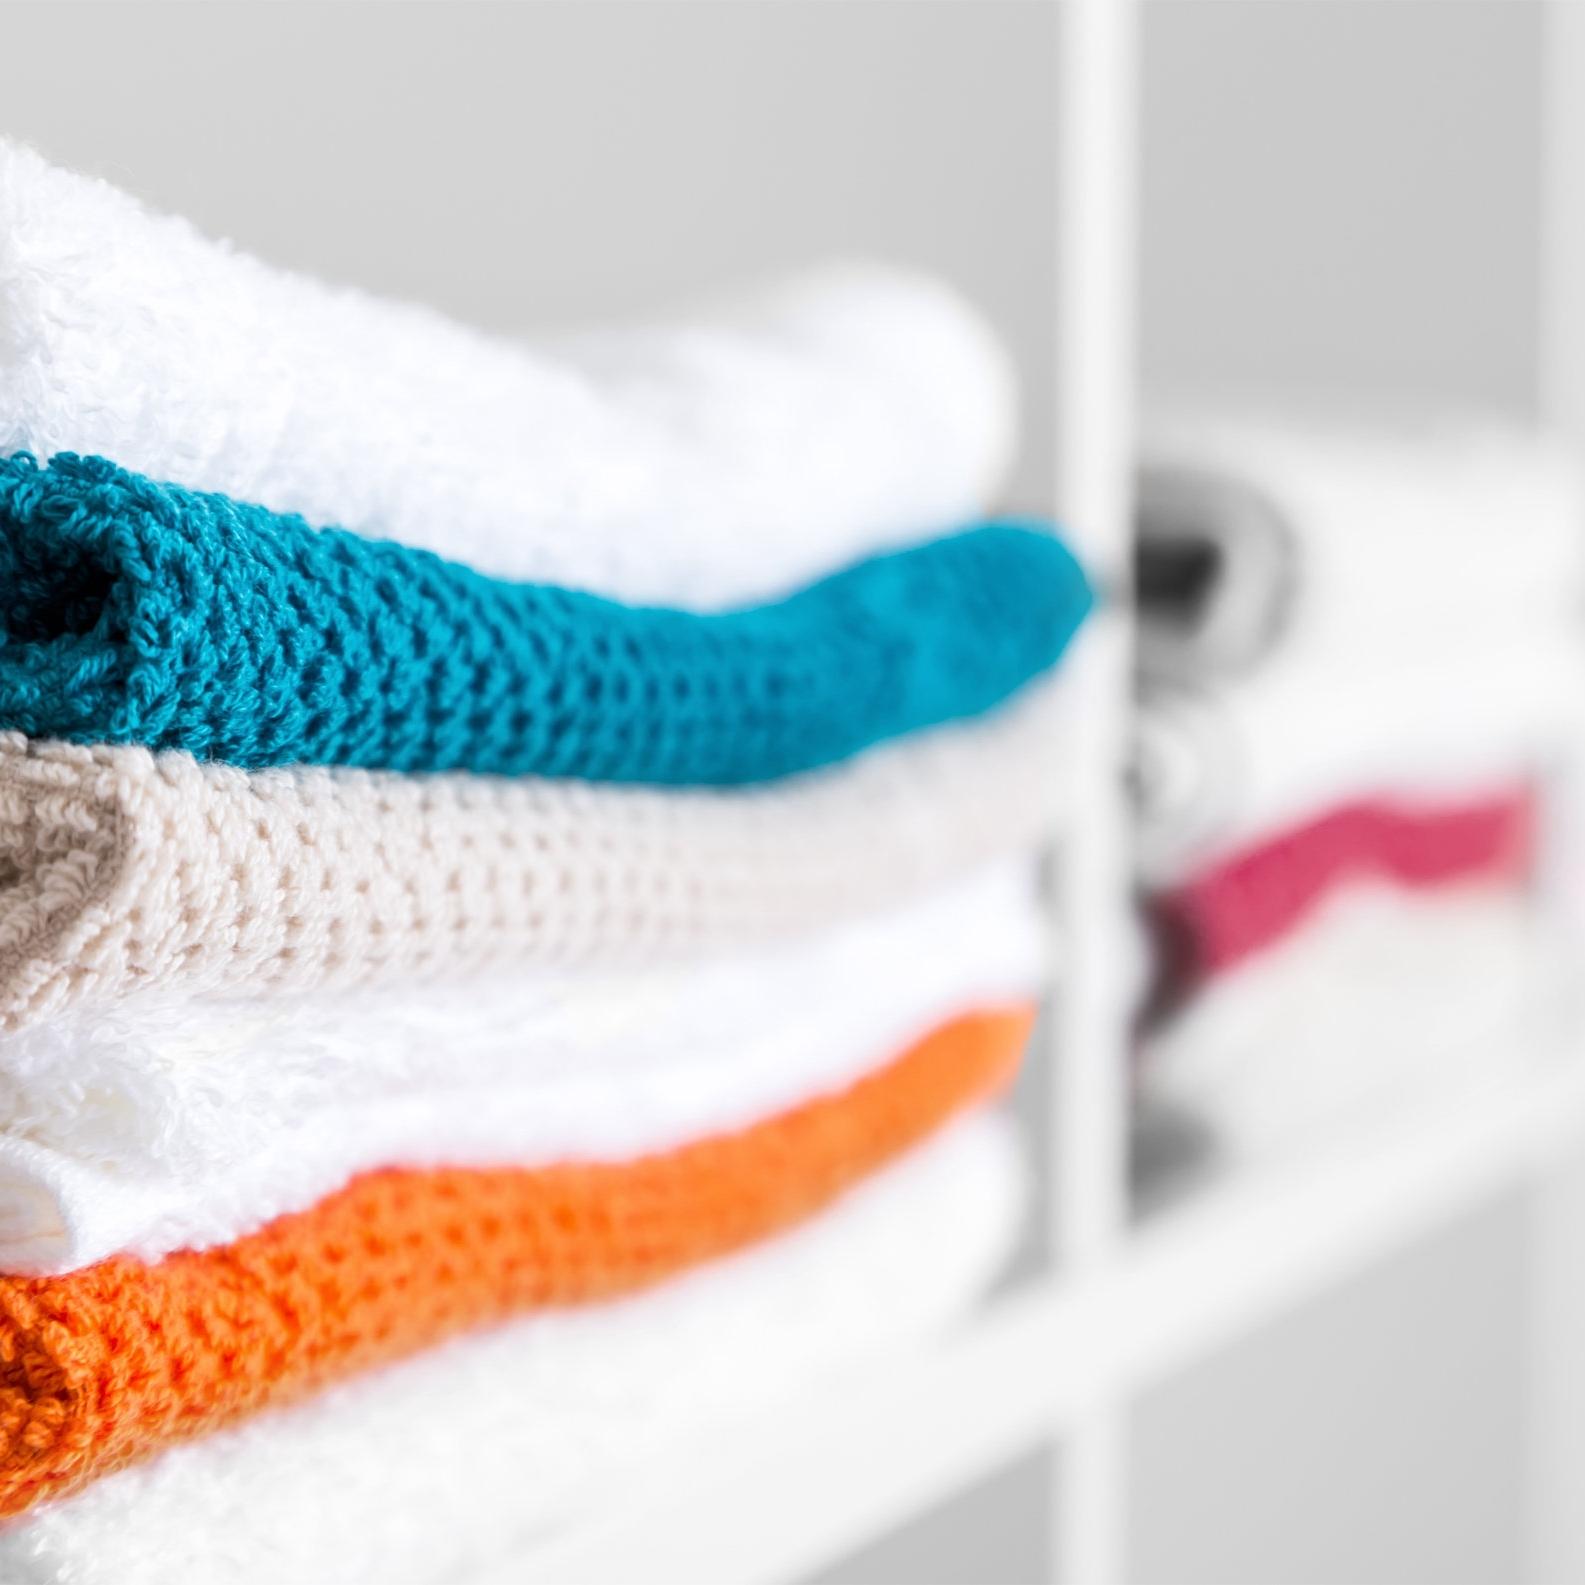 Linen Closets